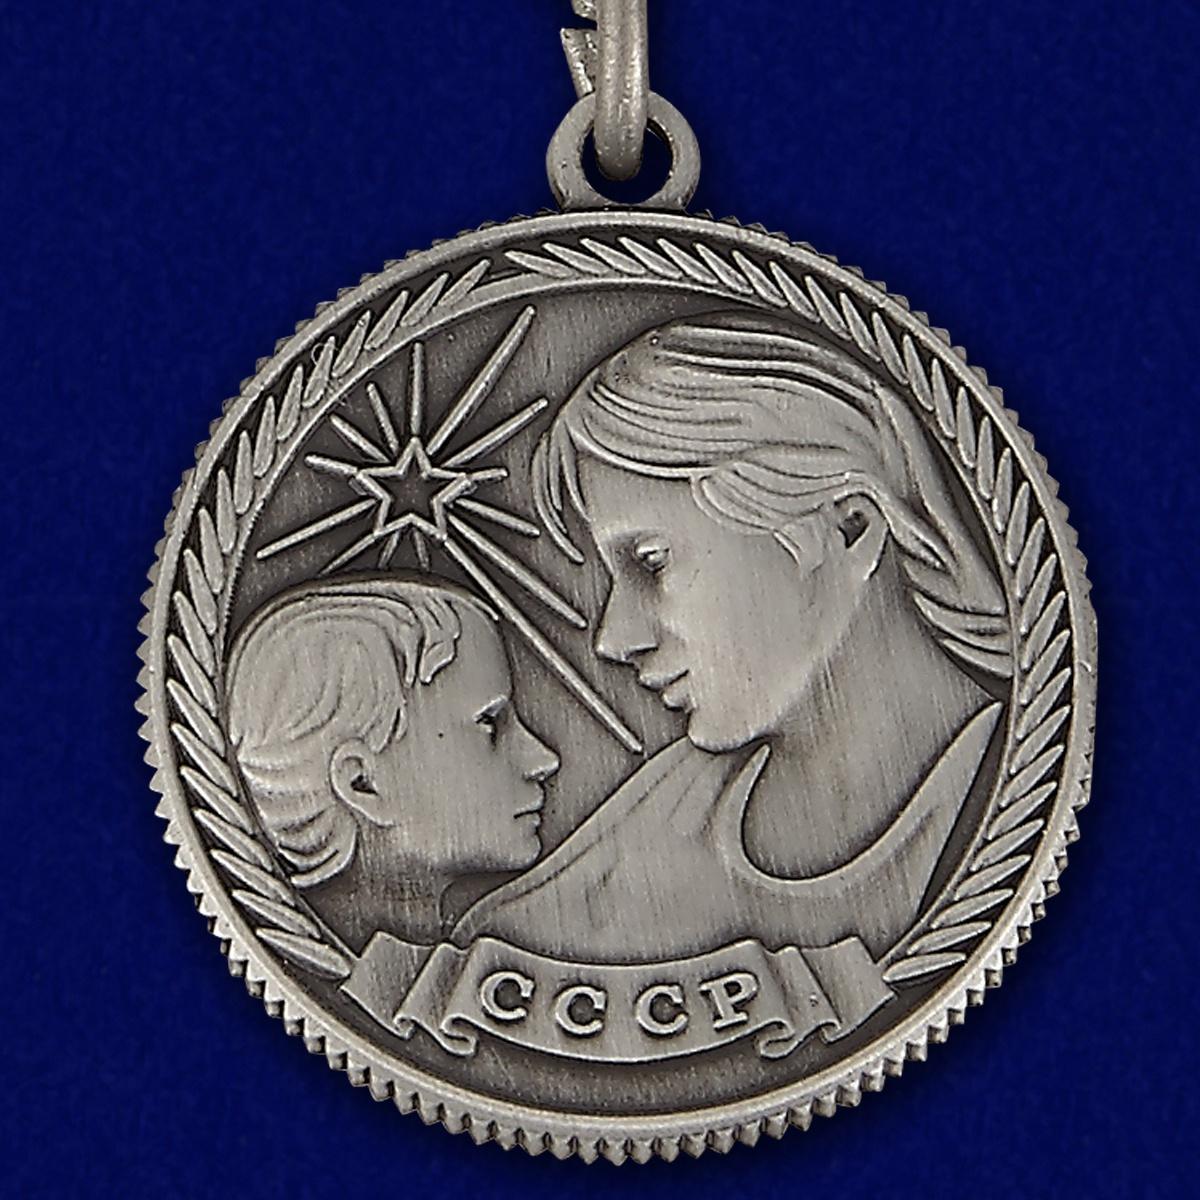 Аверс медали Материнства I степени